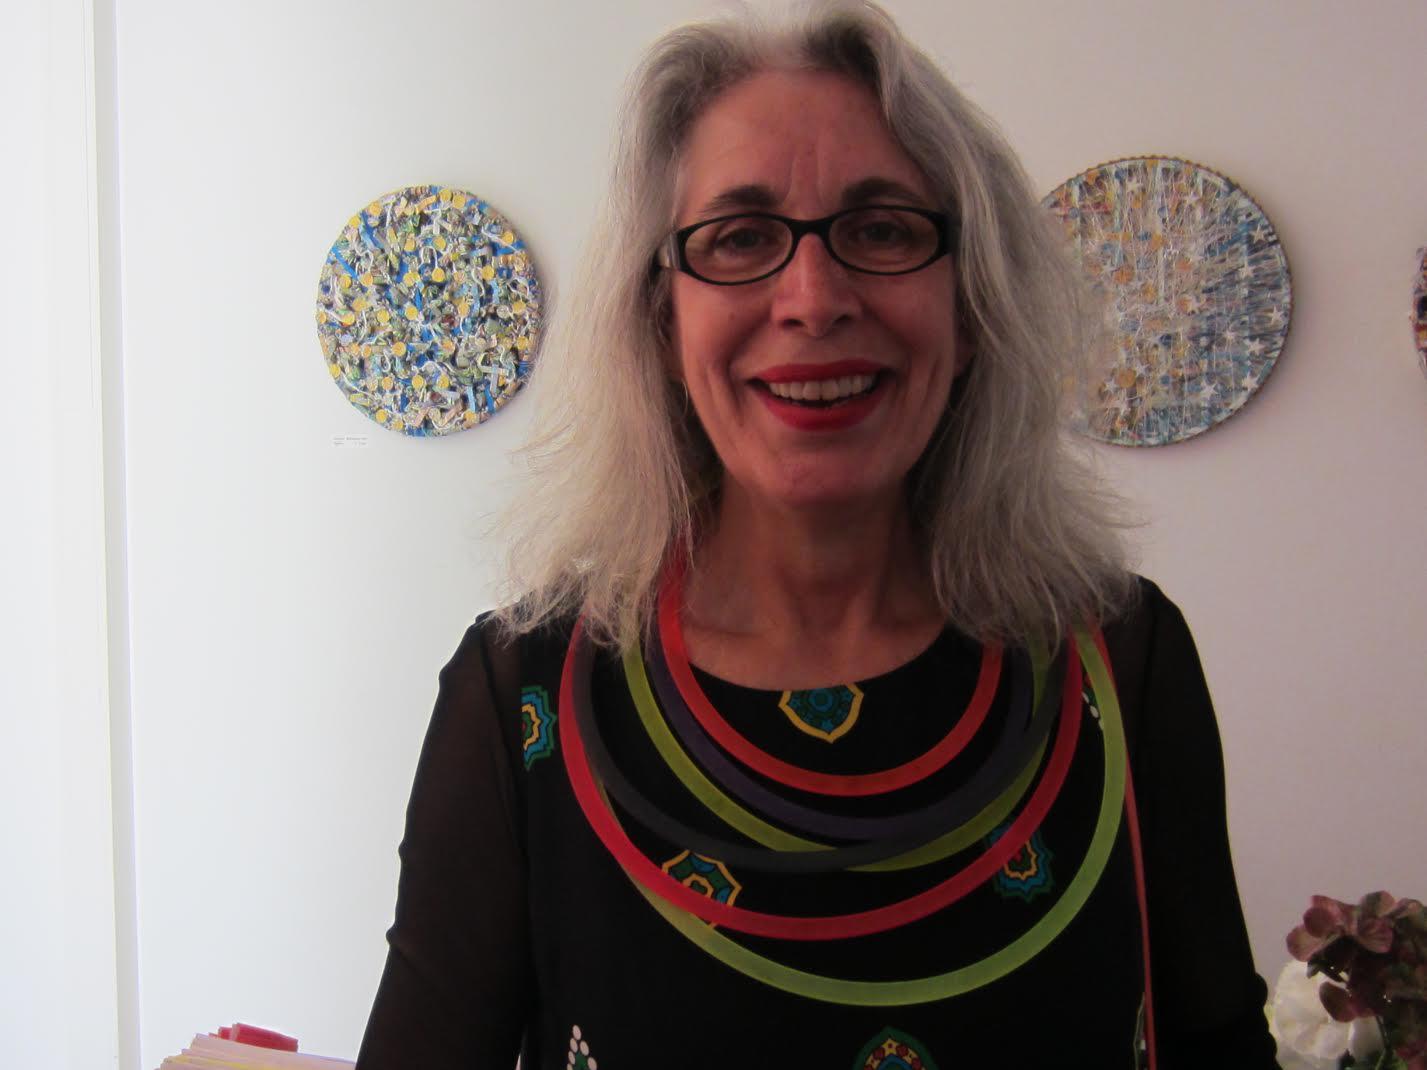 Thea Tolsma draagt Paul Derrez, Galerie Ra, 20 mei 2017. Foto met dank aan M.O.©